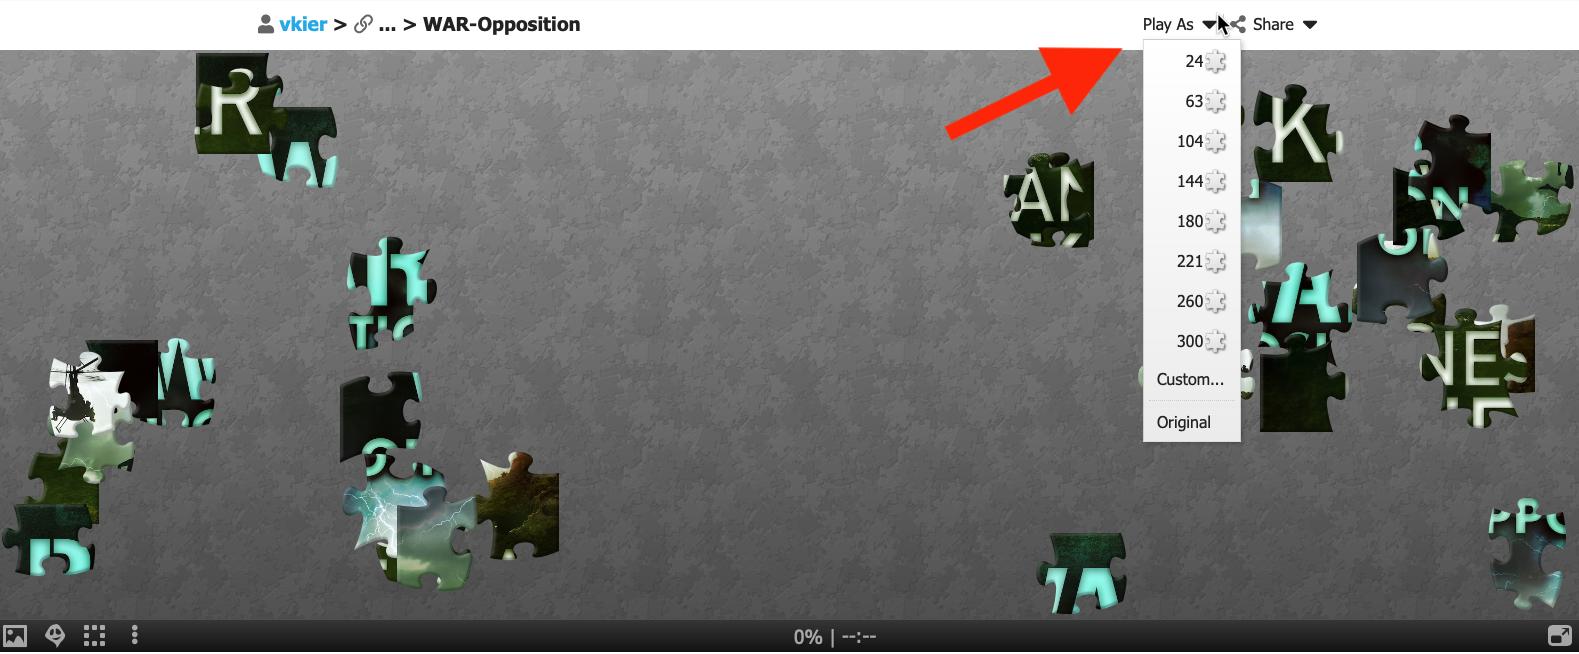 arrow pointing to dropdown menu in online puzle